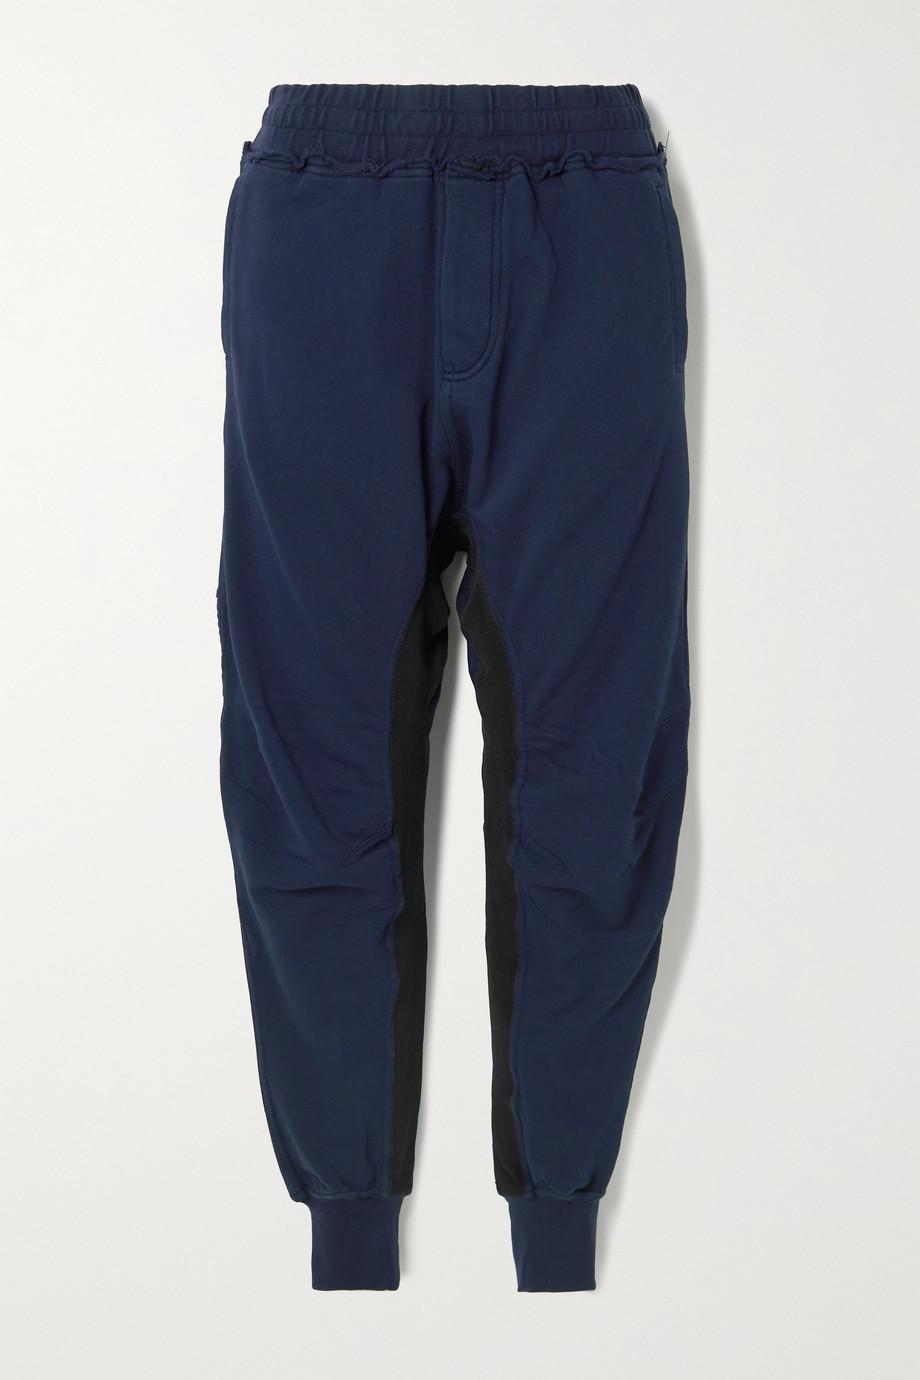 Haider Ackermann Moonshape paneled cotton-jersey track pants